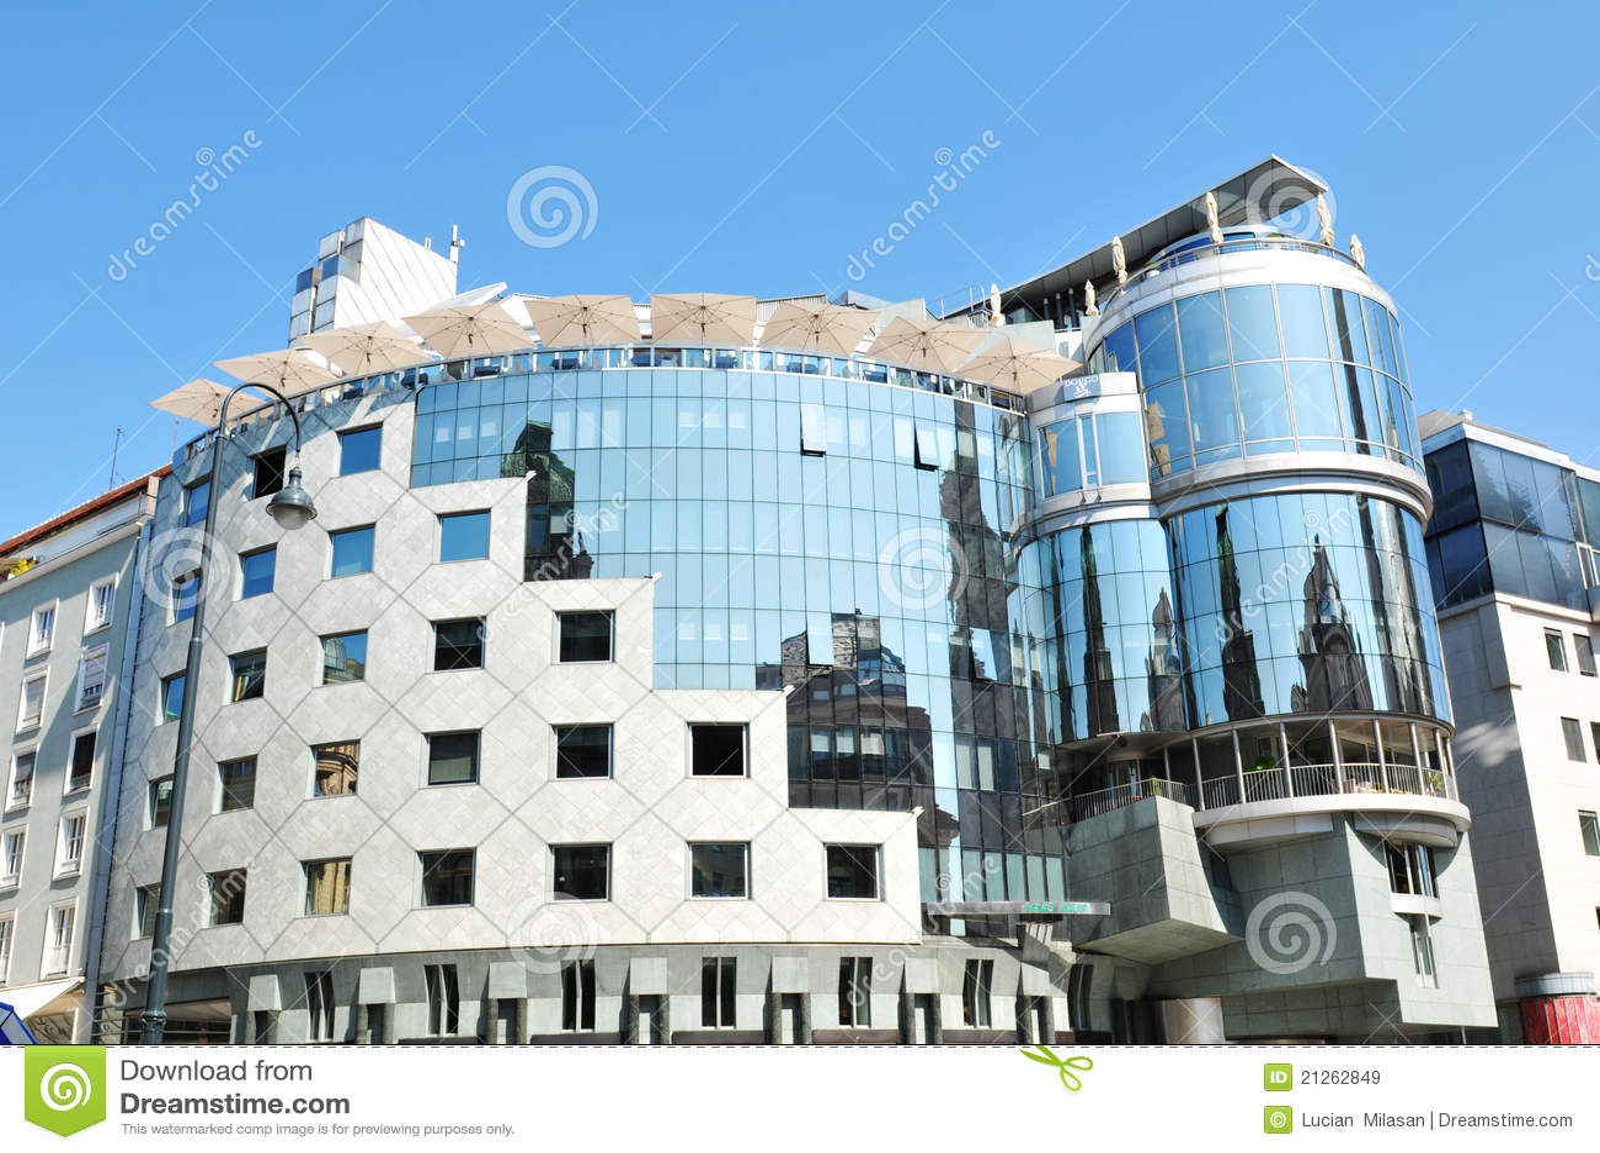 Architettura moderna immagine stock immagine di for L architettura moderna